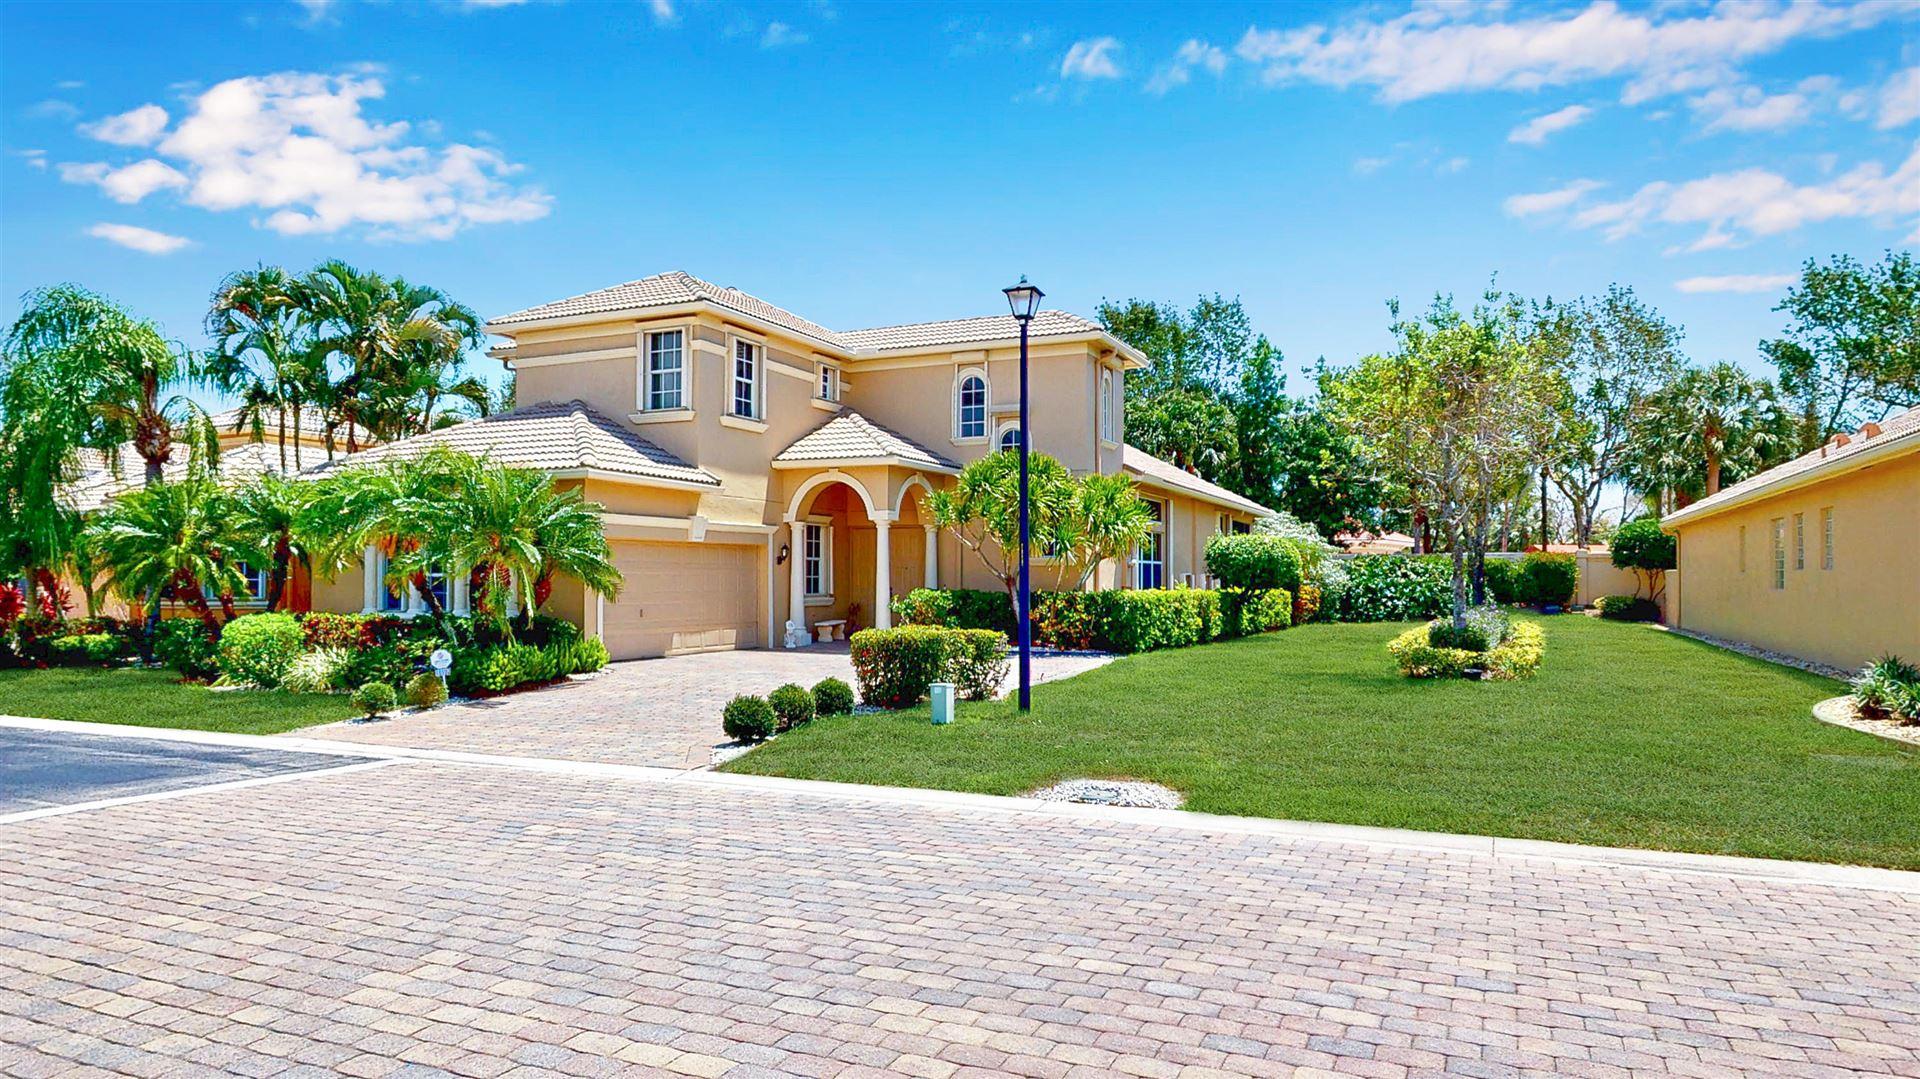 10102 Armani Drive, Boynton Beach, FL 33437 - MLS#: RX-10714023